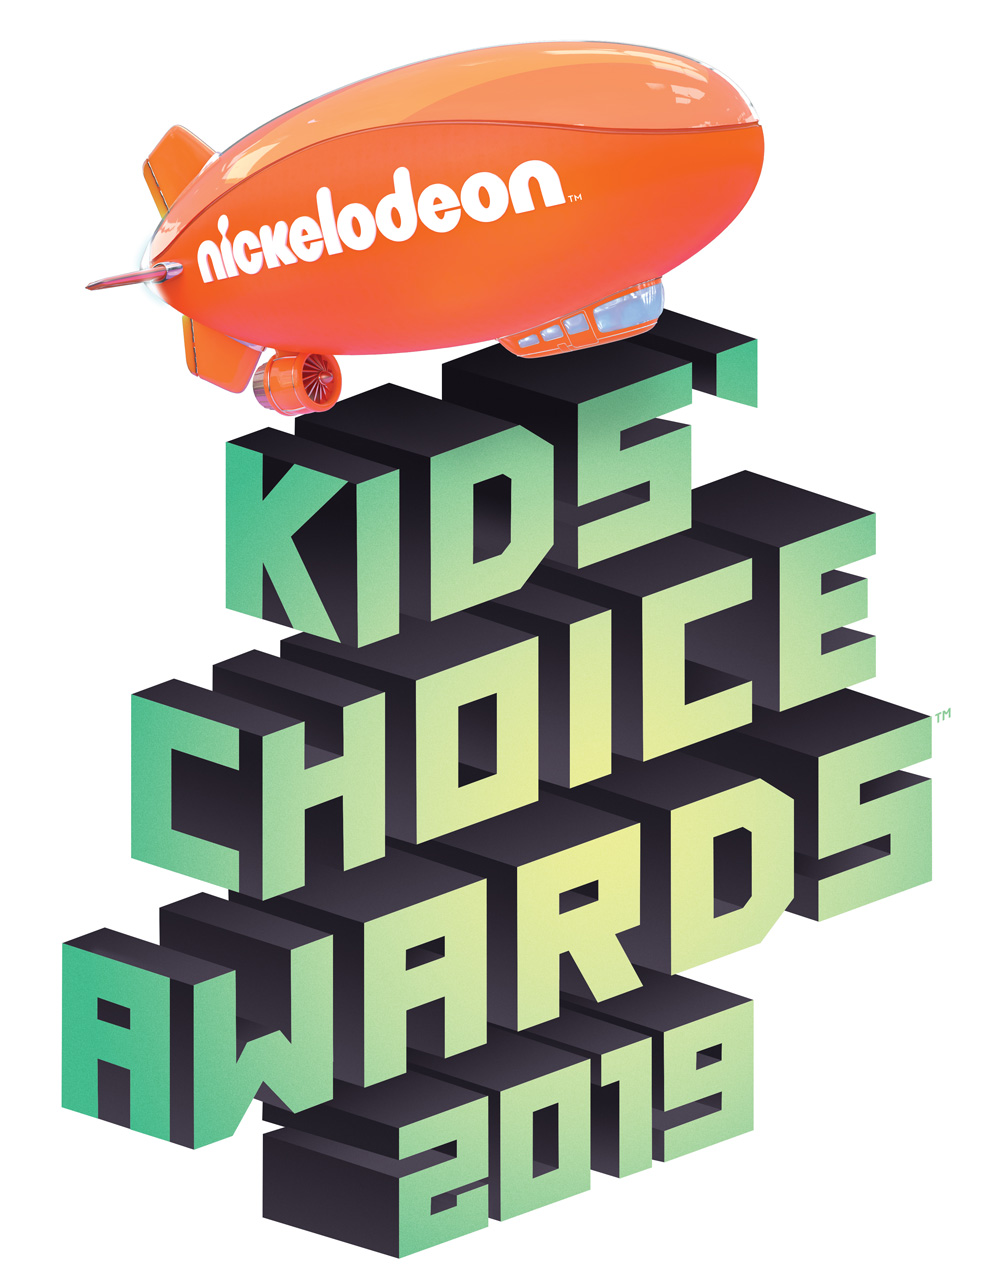 Nickelodeon Kid's Choice Awards 2019